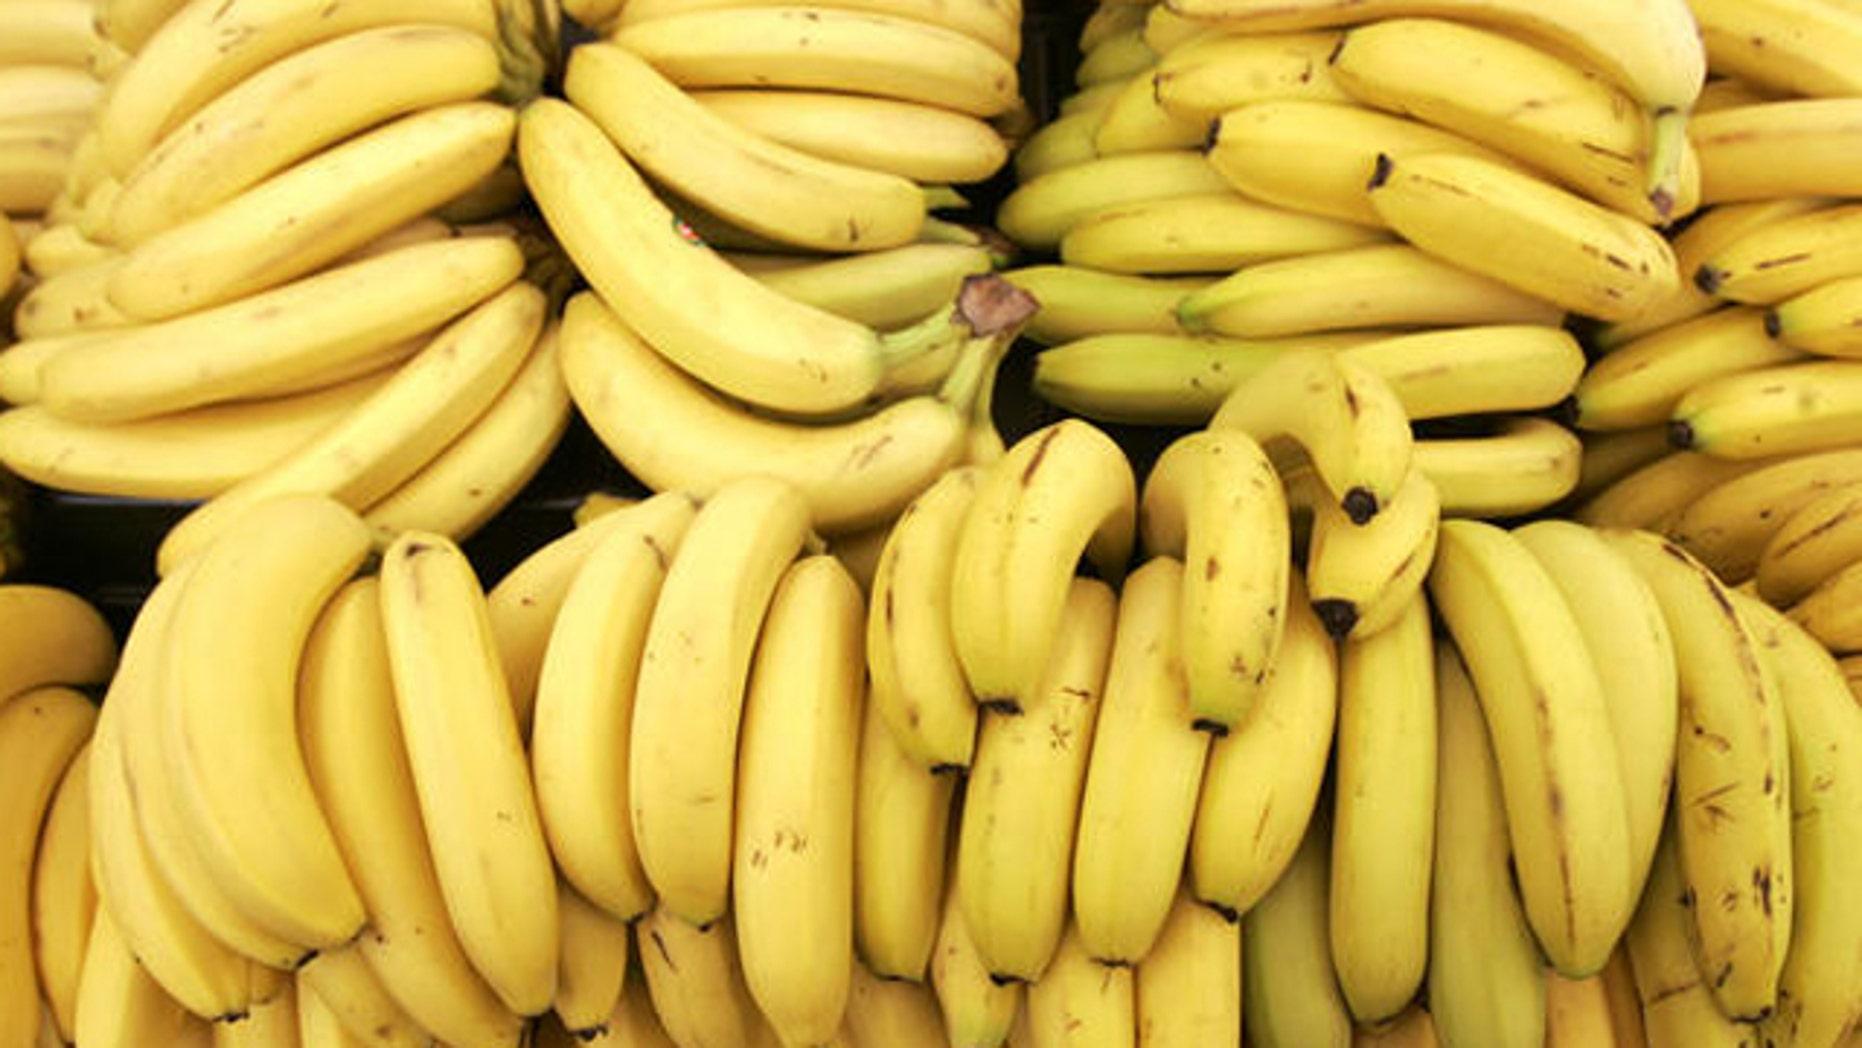 Banana fungus threaten the global supply of one of America's favorite snack.